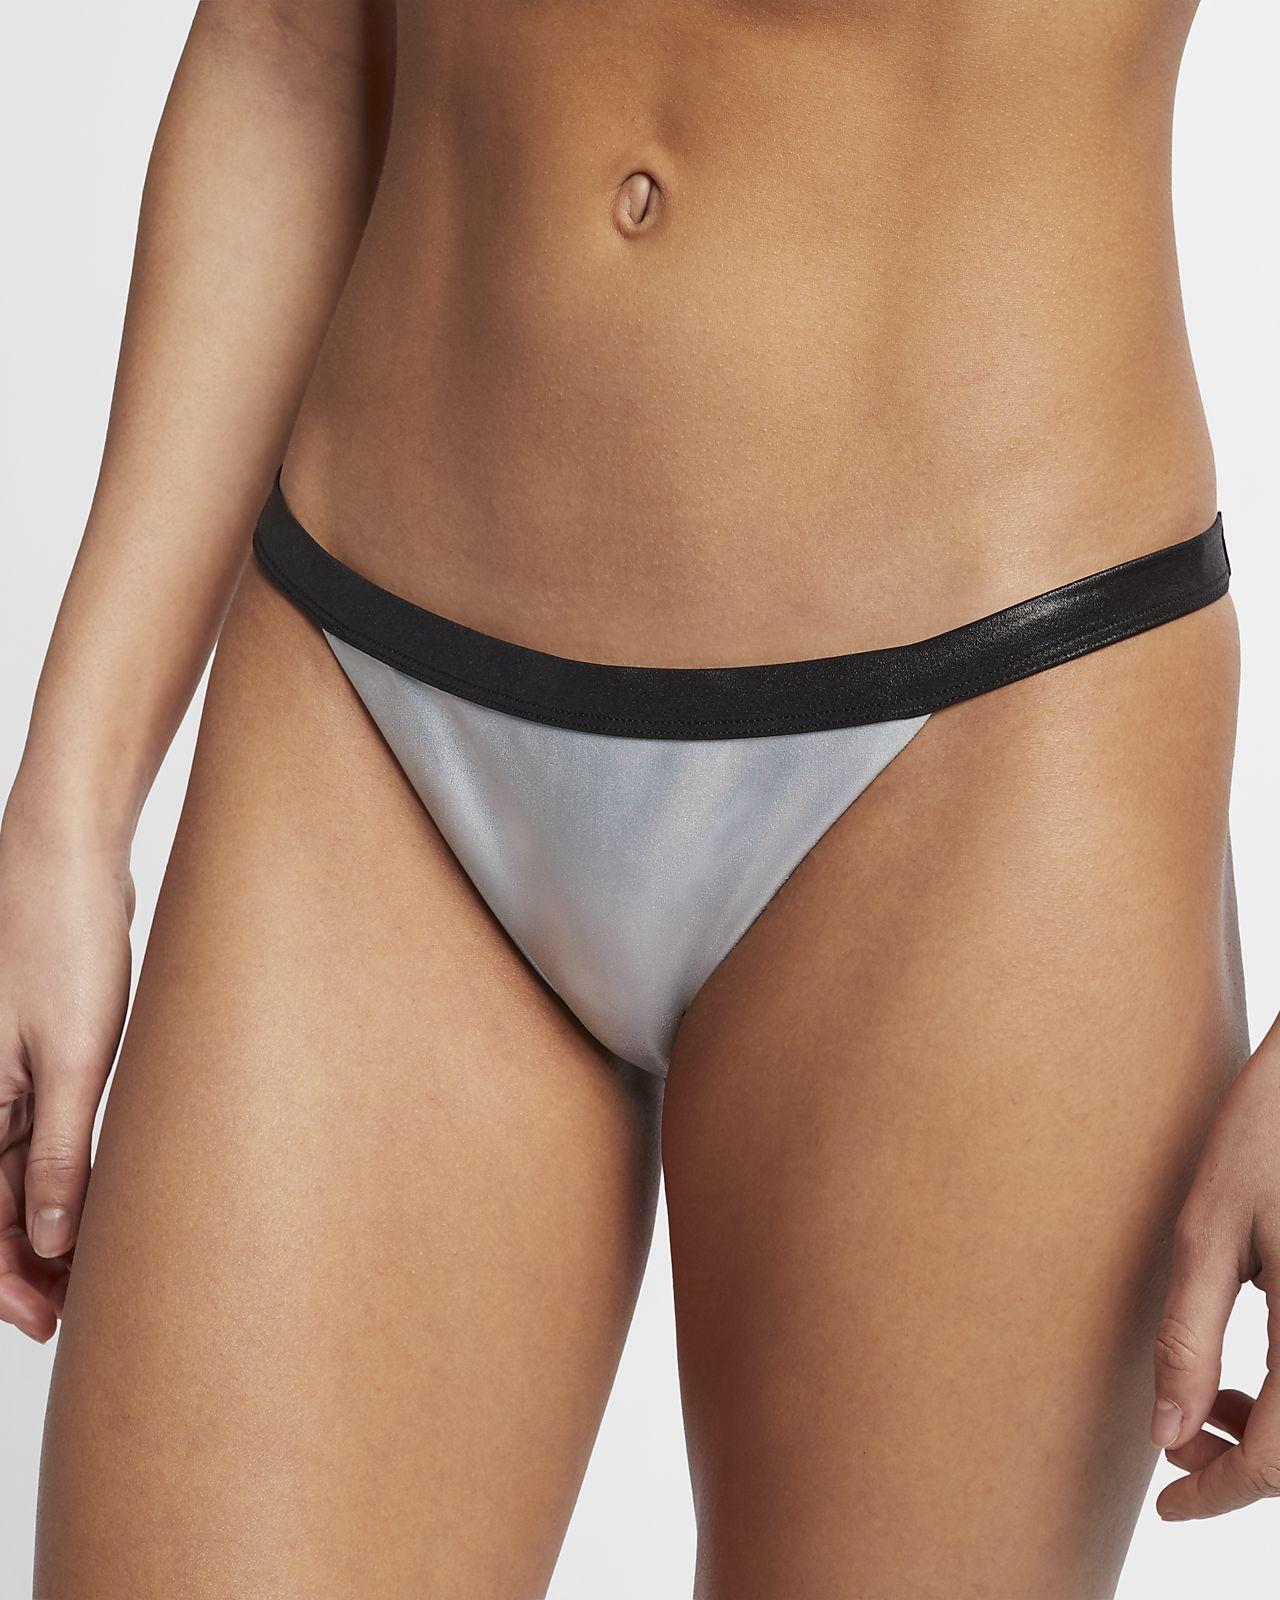 Bikiniunderdel Nike Flash Sport Bikini för kvinnor